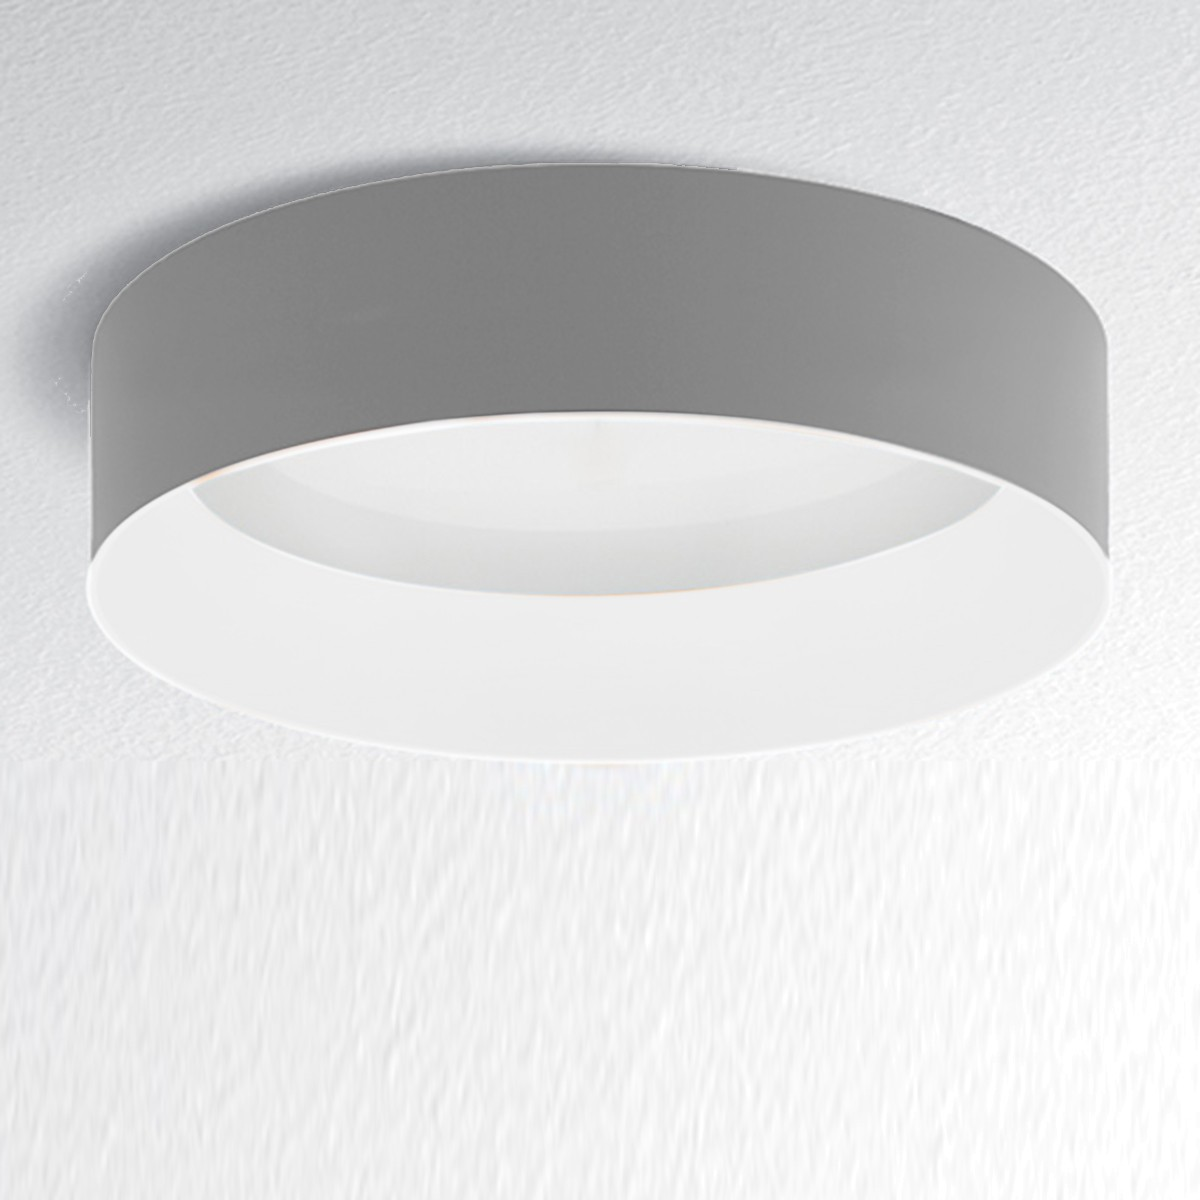 Artemide Architectural Tagora 970 Deckenleuchte LED, grau - weiß, dimmbar